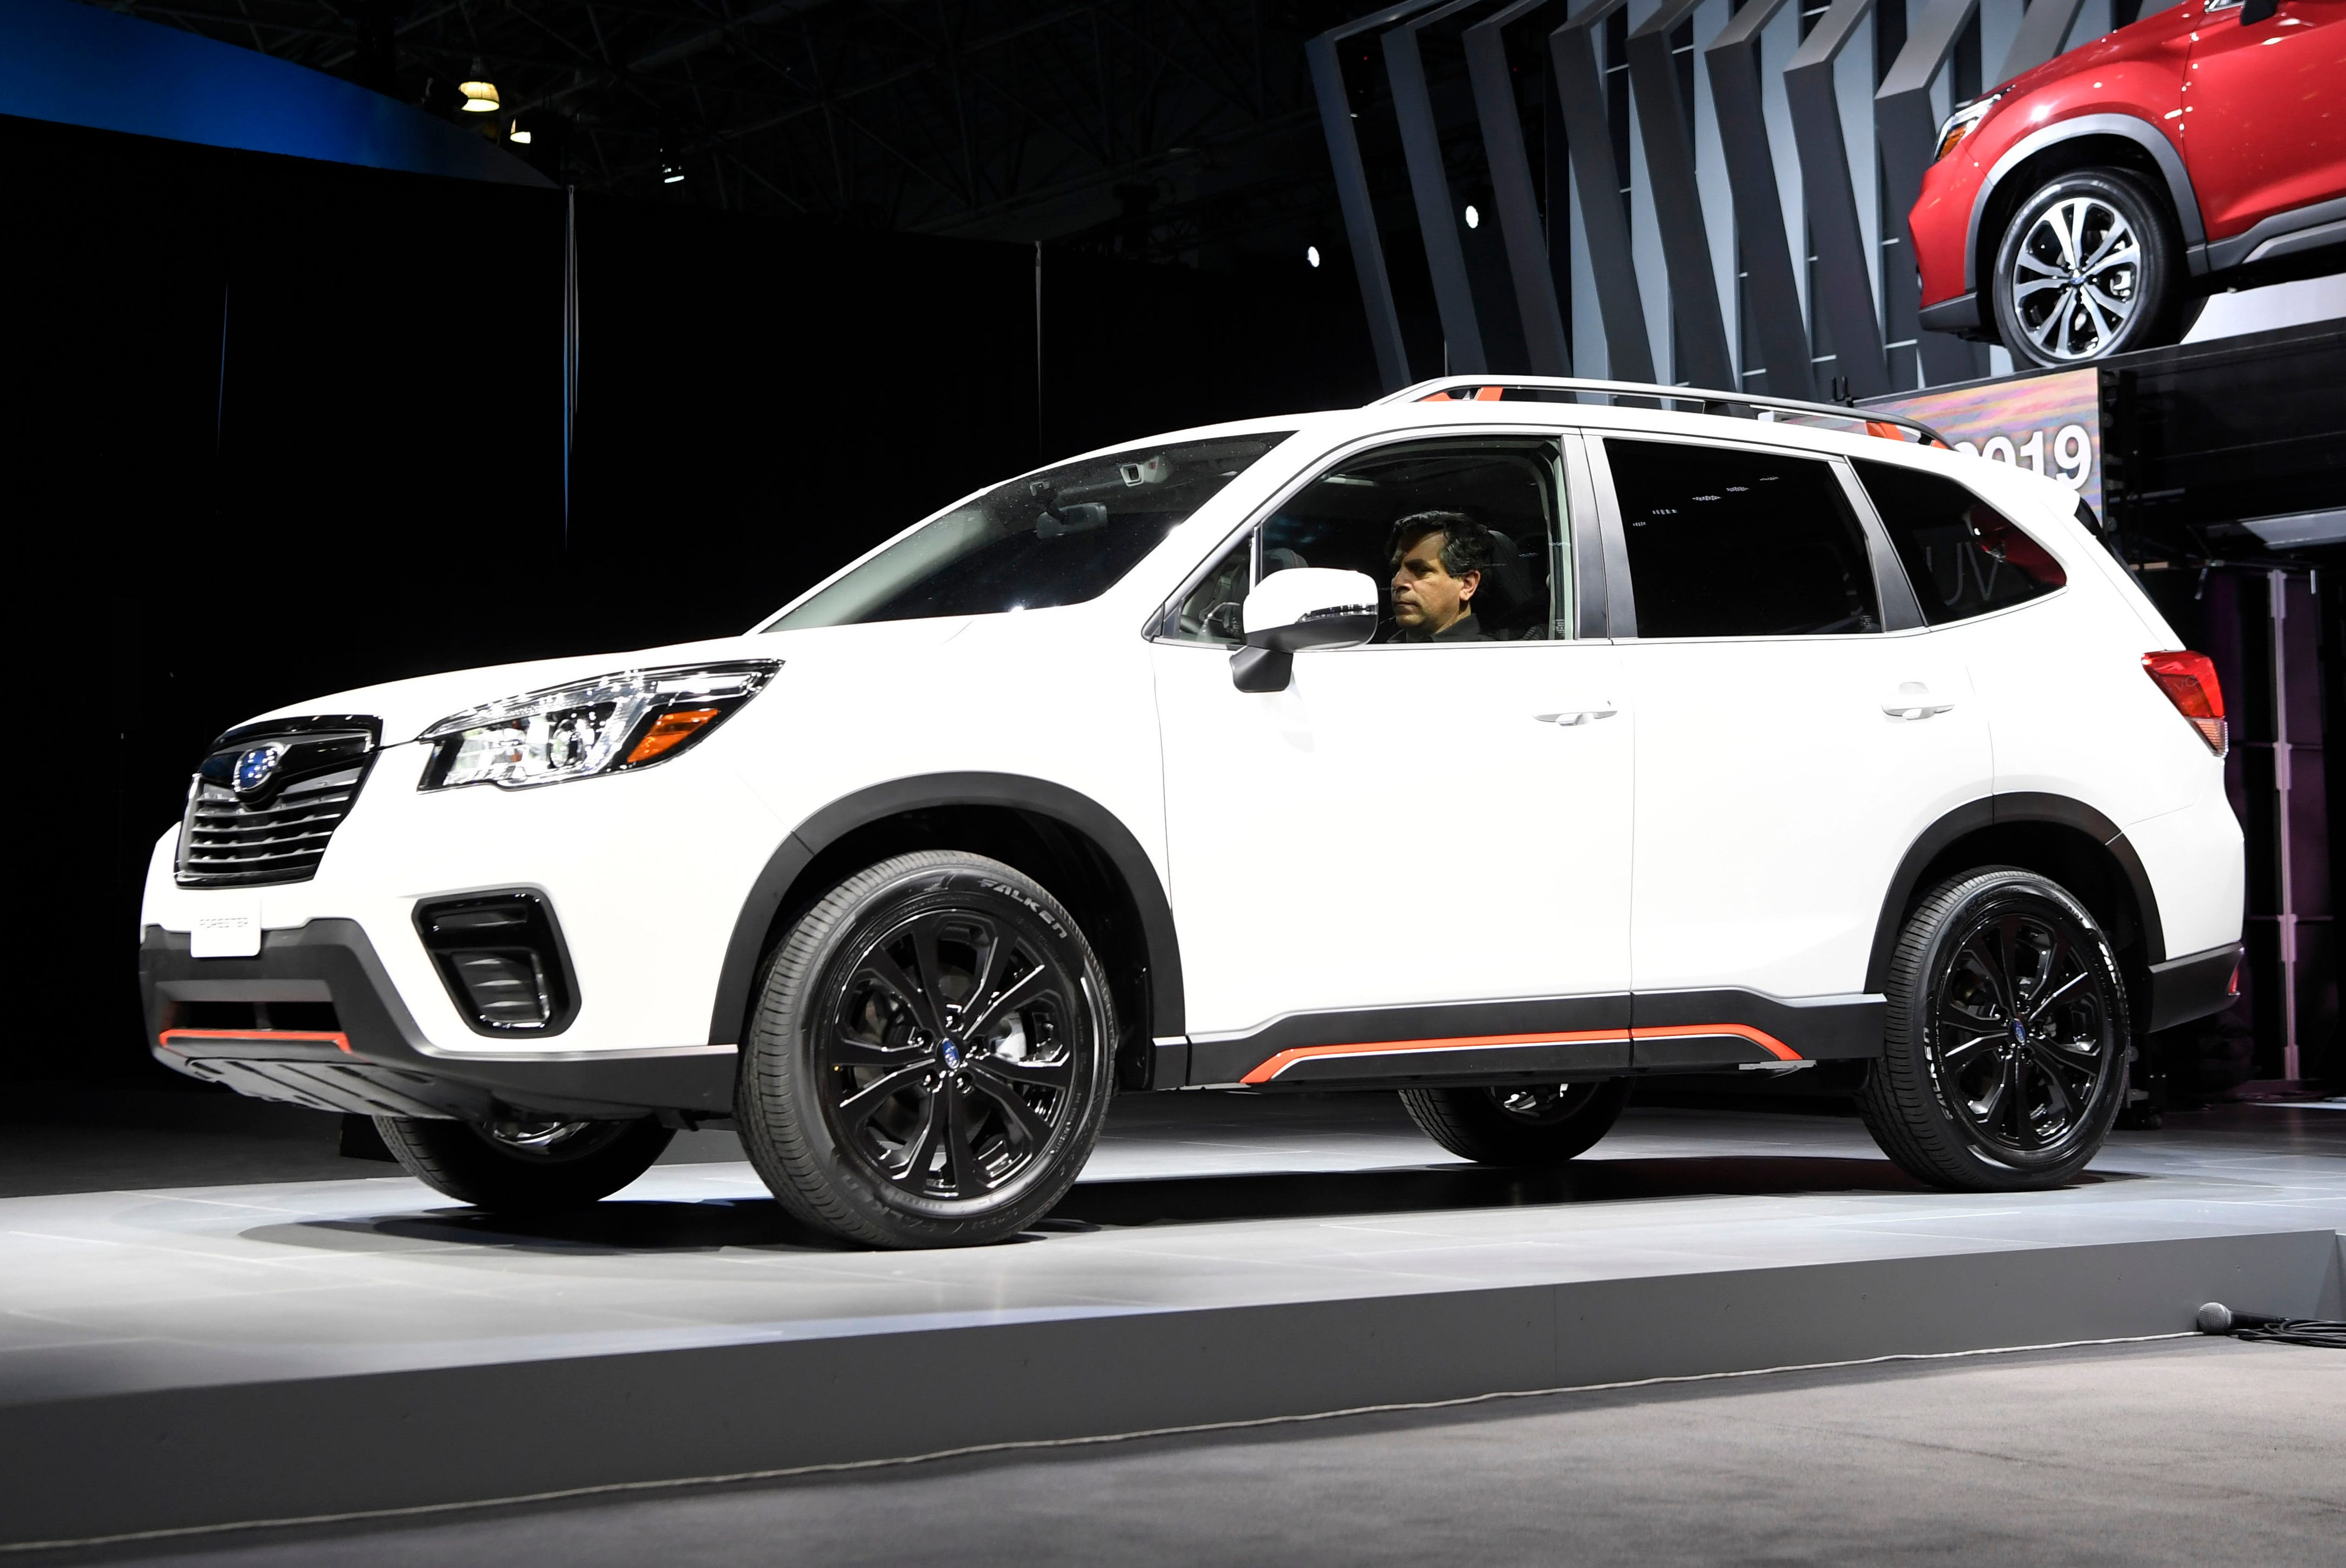 The 2019 Subaru Forester.